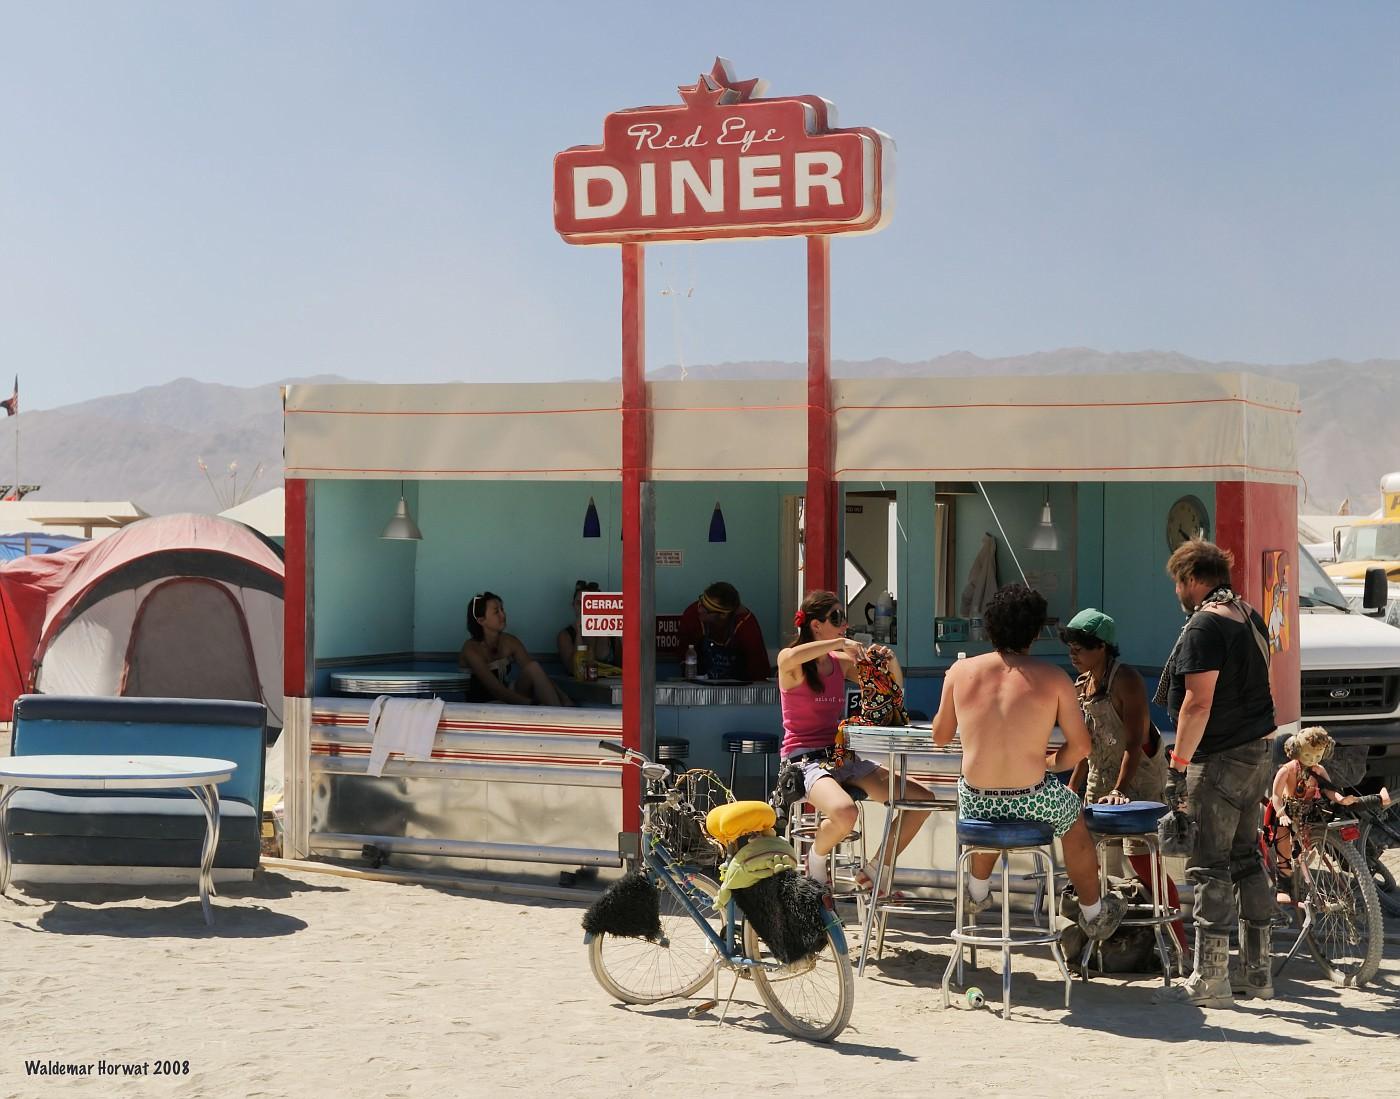 Red Eye Diner